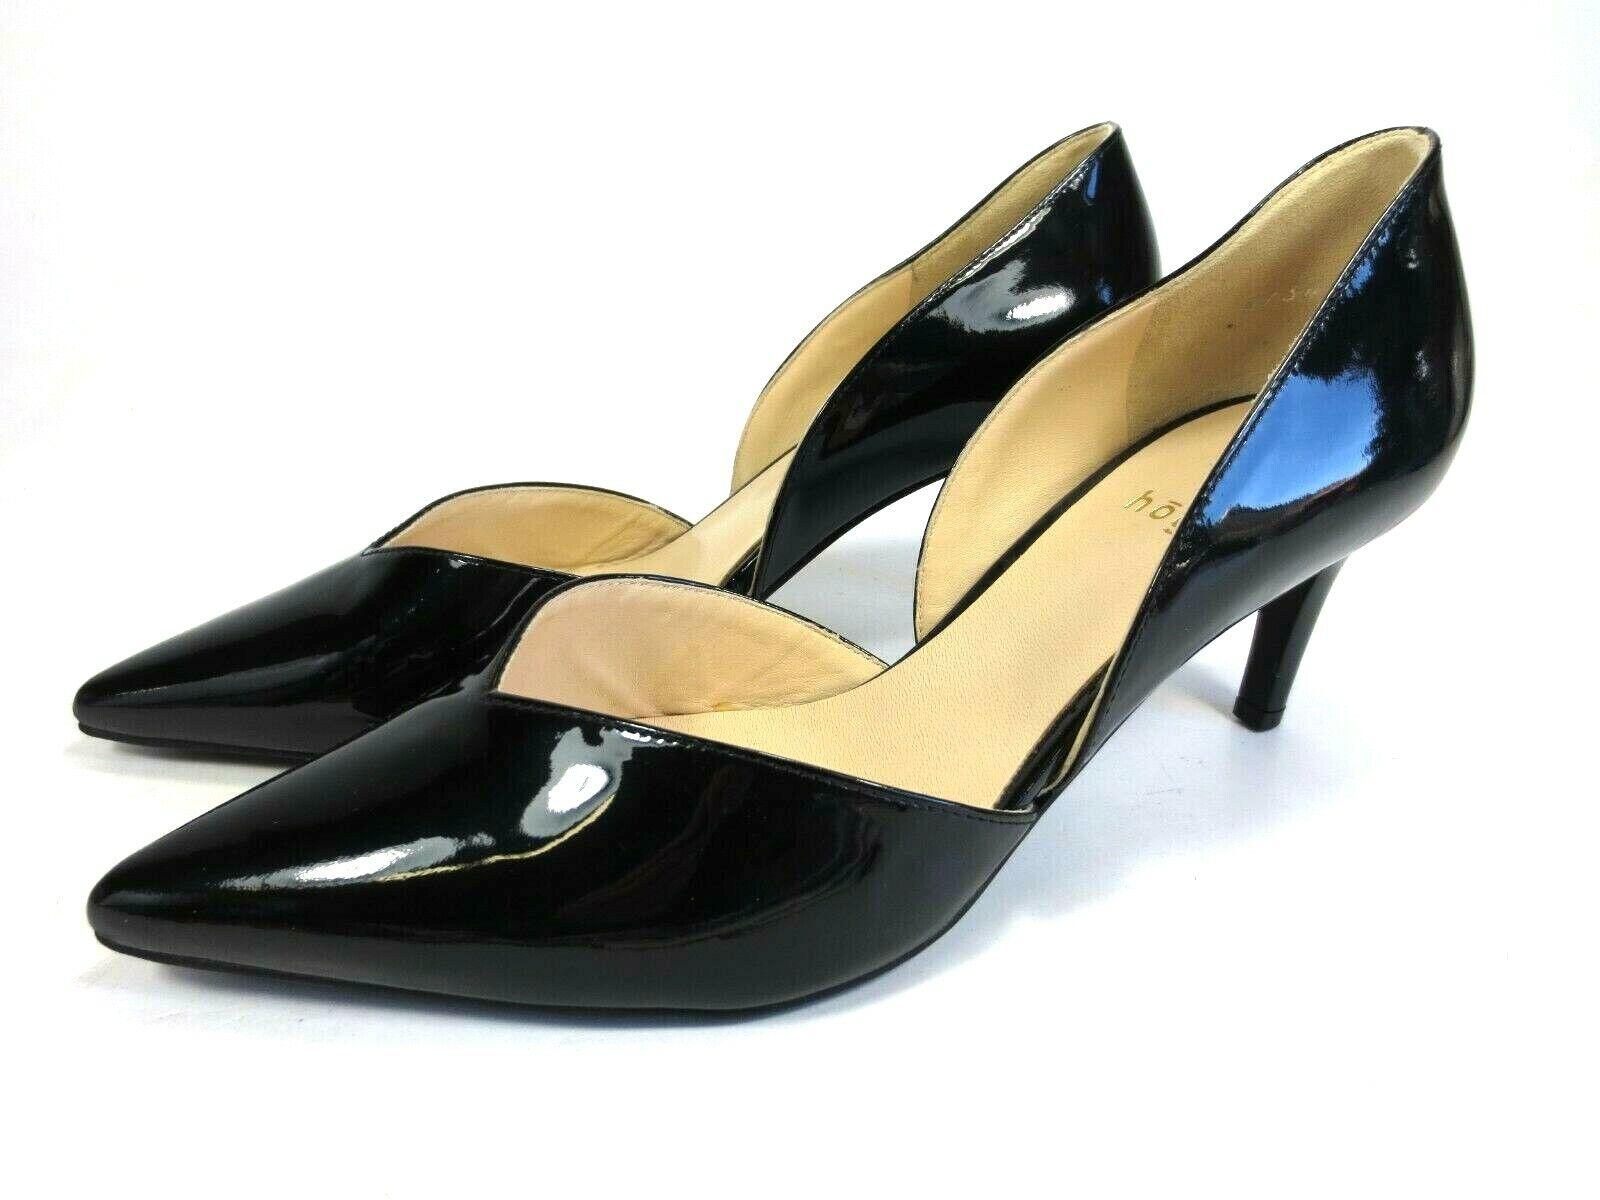 Högl Escarpins Chaussures En Cuir Noir Verni Neuf Prix Recomhommedé 109,95 Fête Abiball